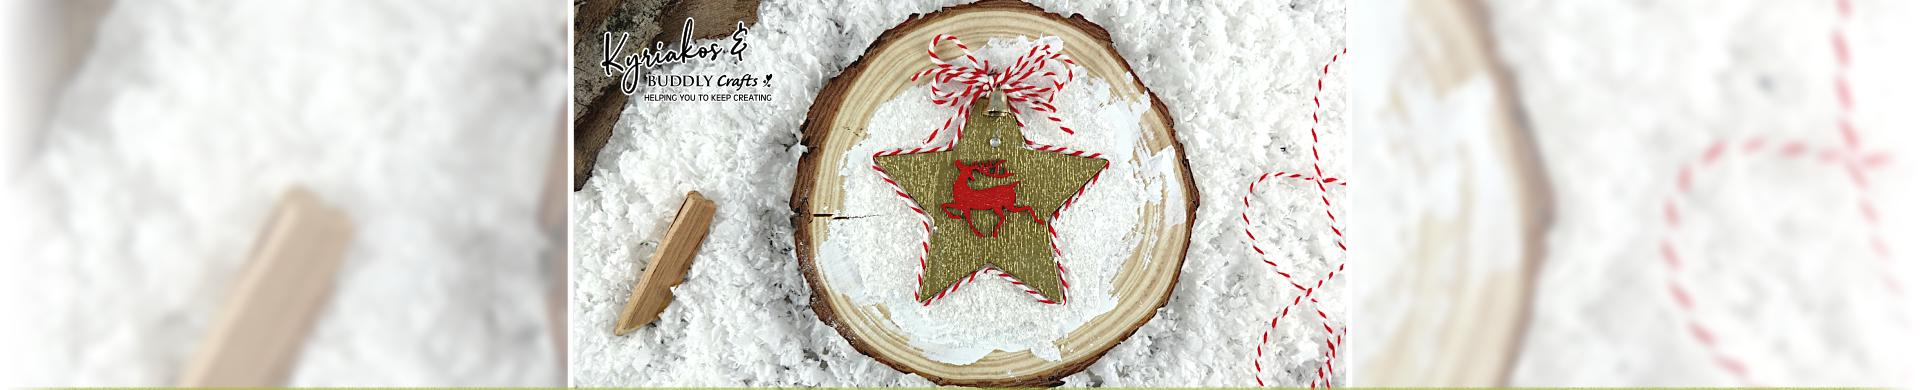 Bare Wood Christmas Shapes & Hangers